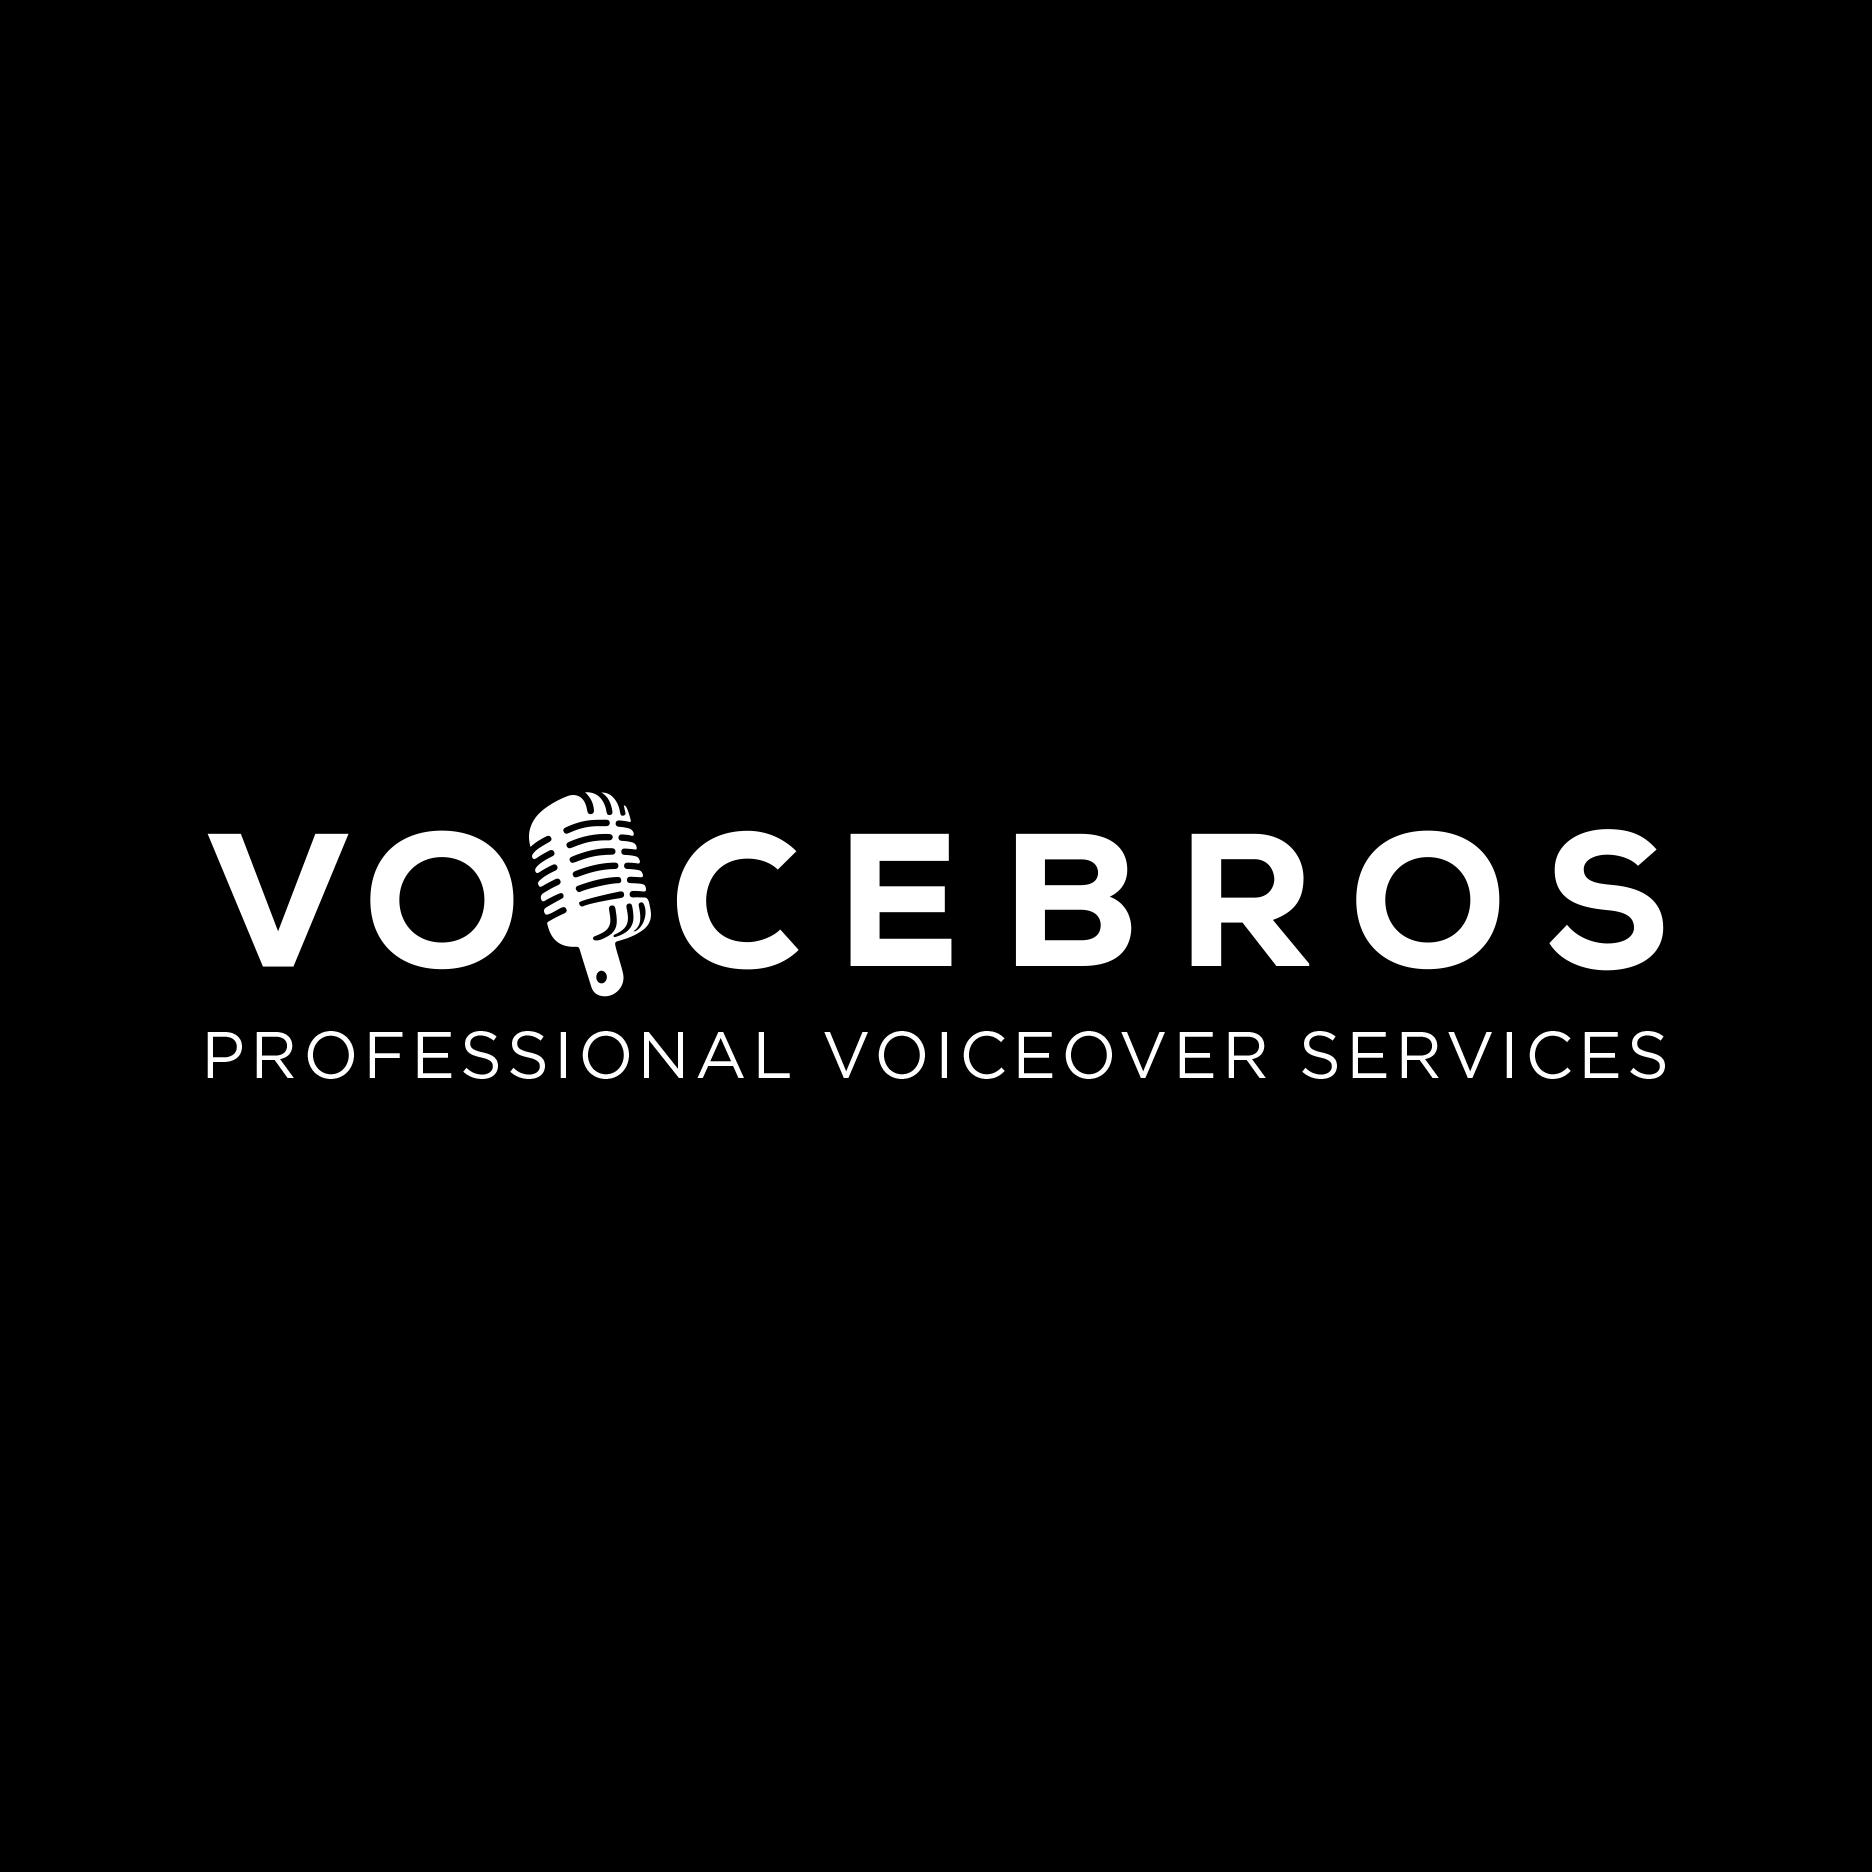 mehrd esmal is a voice over actor